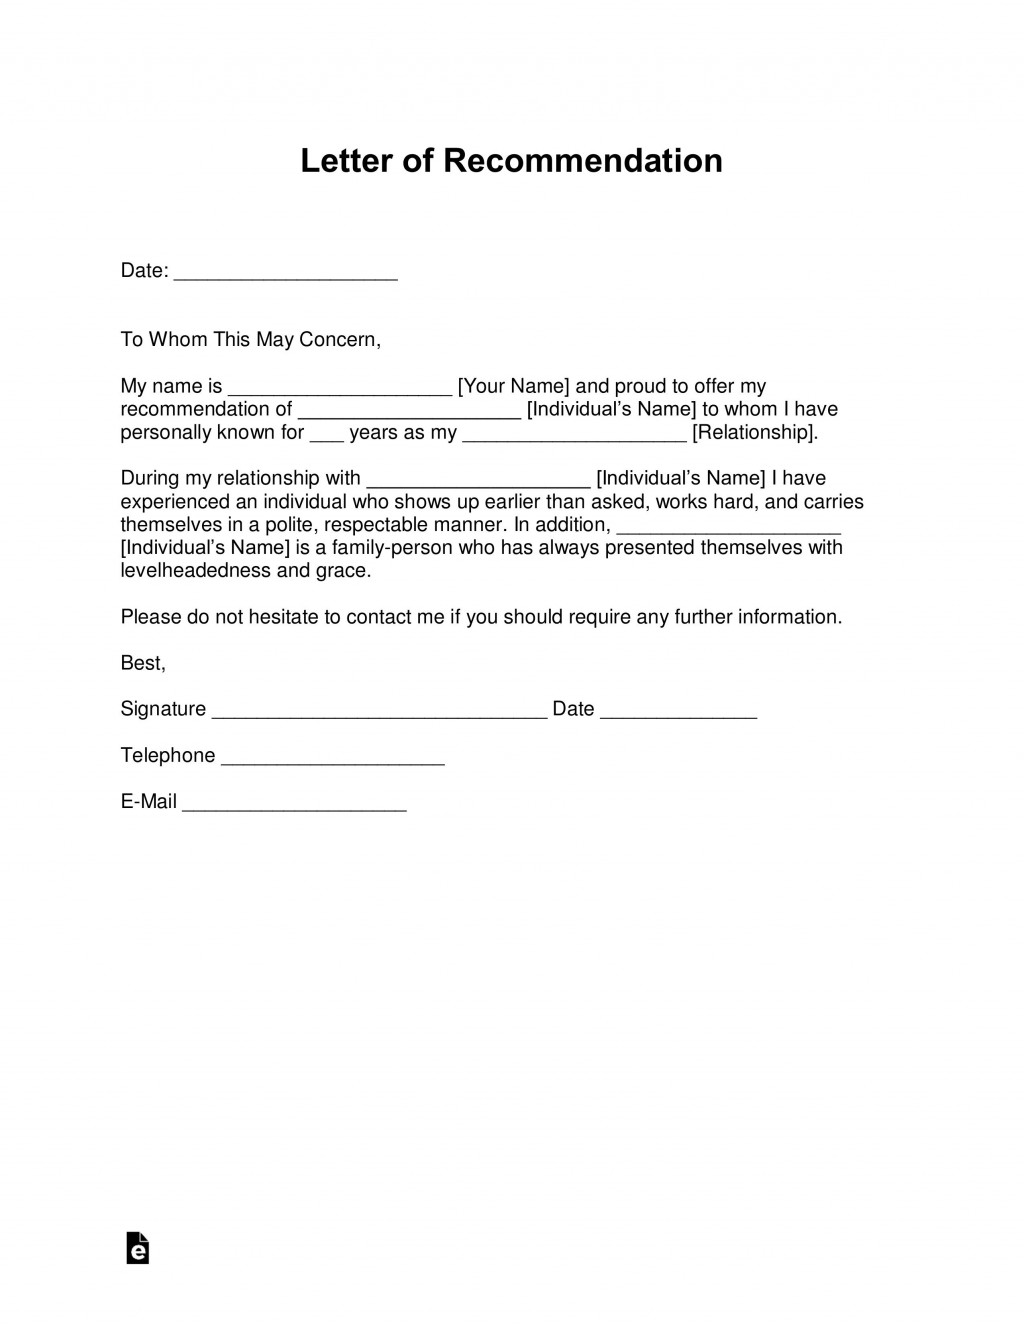 008 Impressive Letter Of Recommendation Template Word Concept  General UkLarge